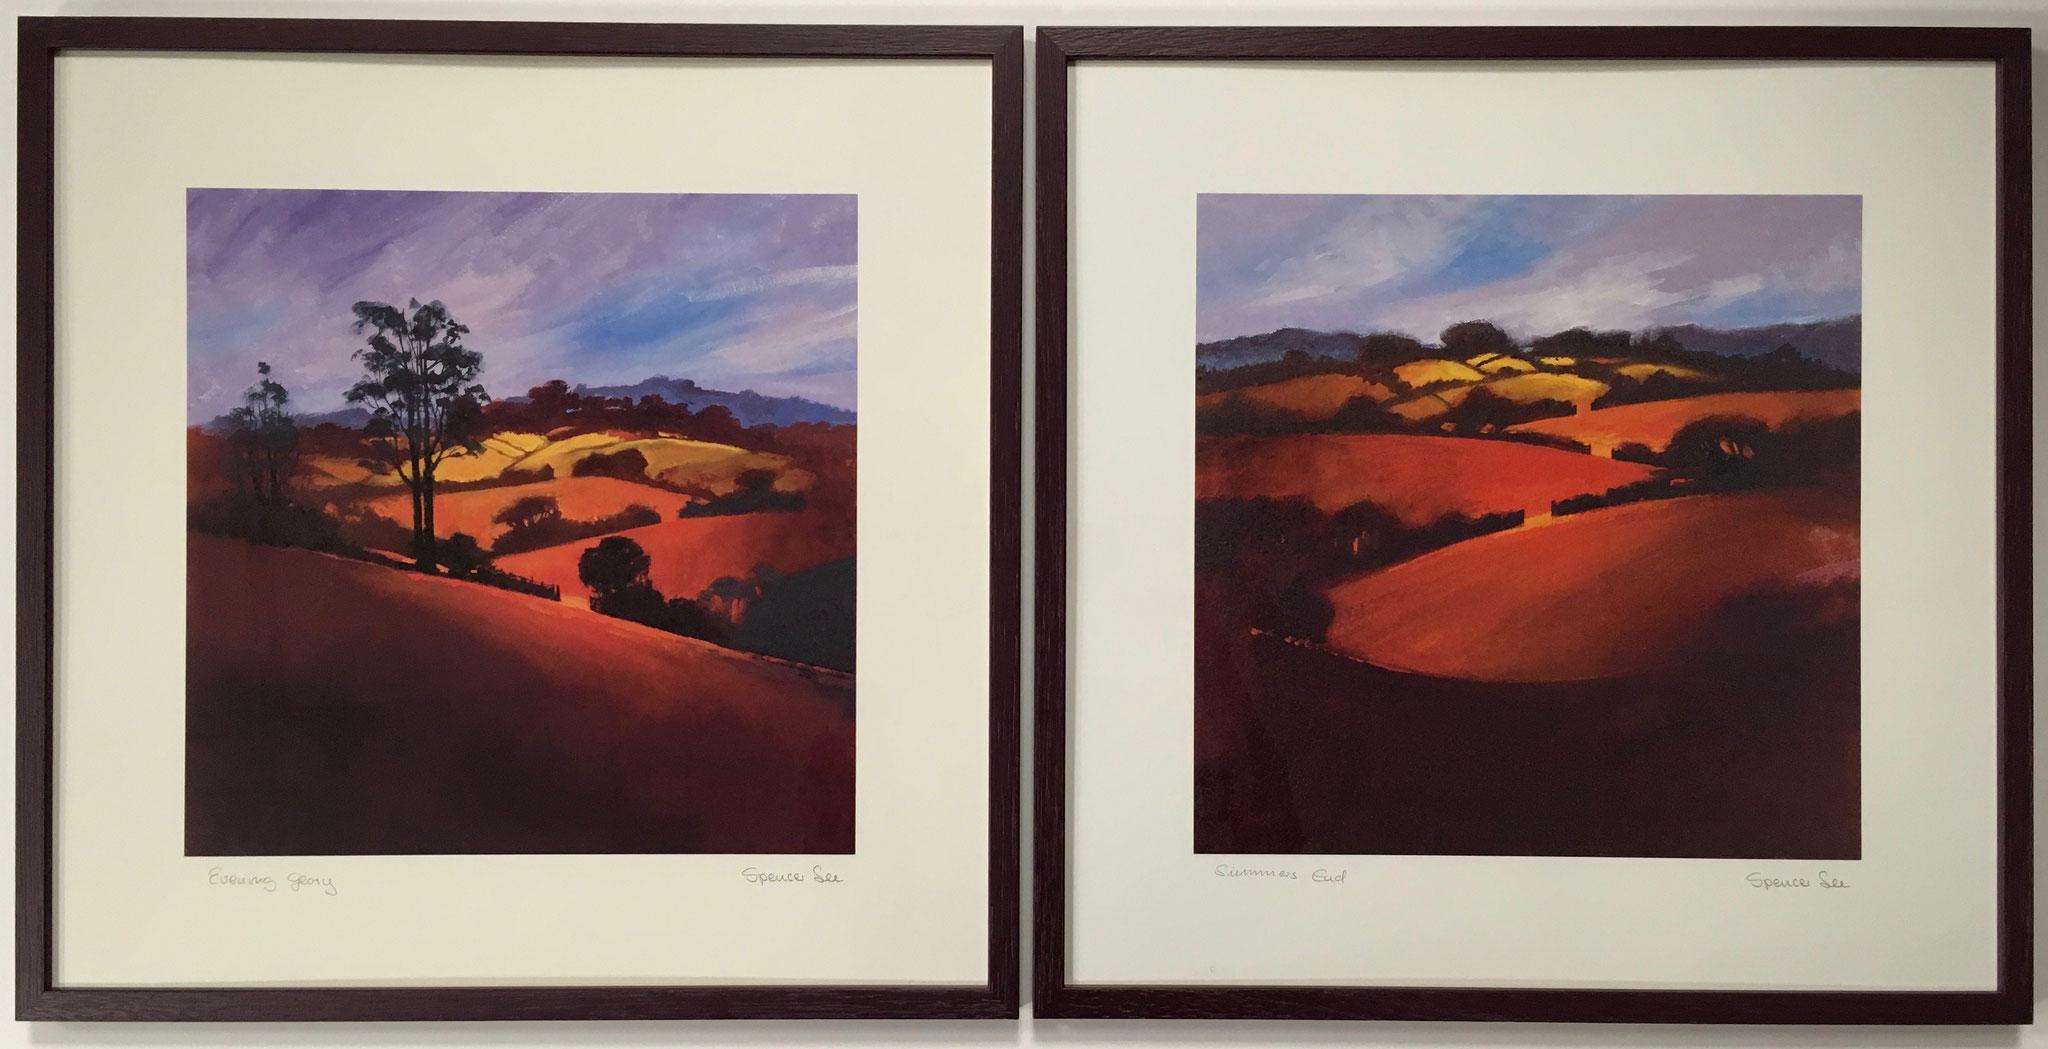 "Spencer ""Evening glory + Summer End"" 2 Kunstdrucke in Holzrahmen Größe/Falzmaß: 50,0 x 50,0cm je € 110,-"